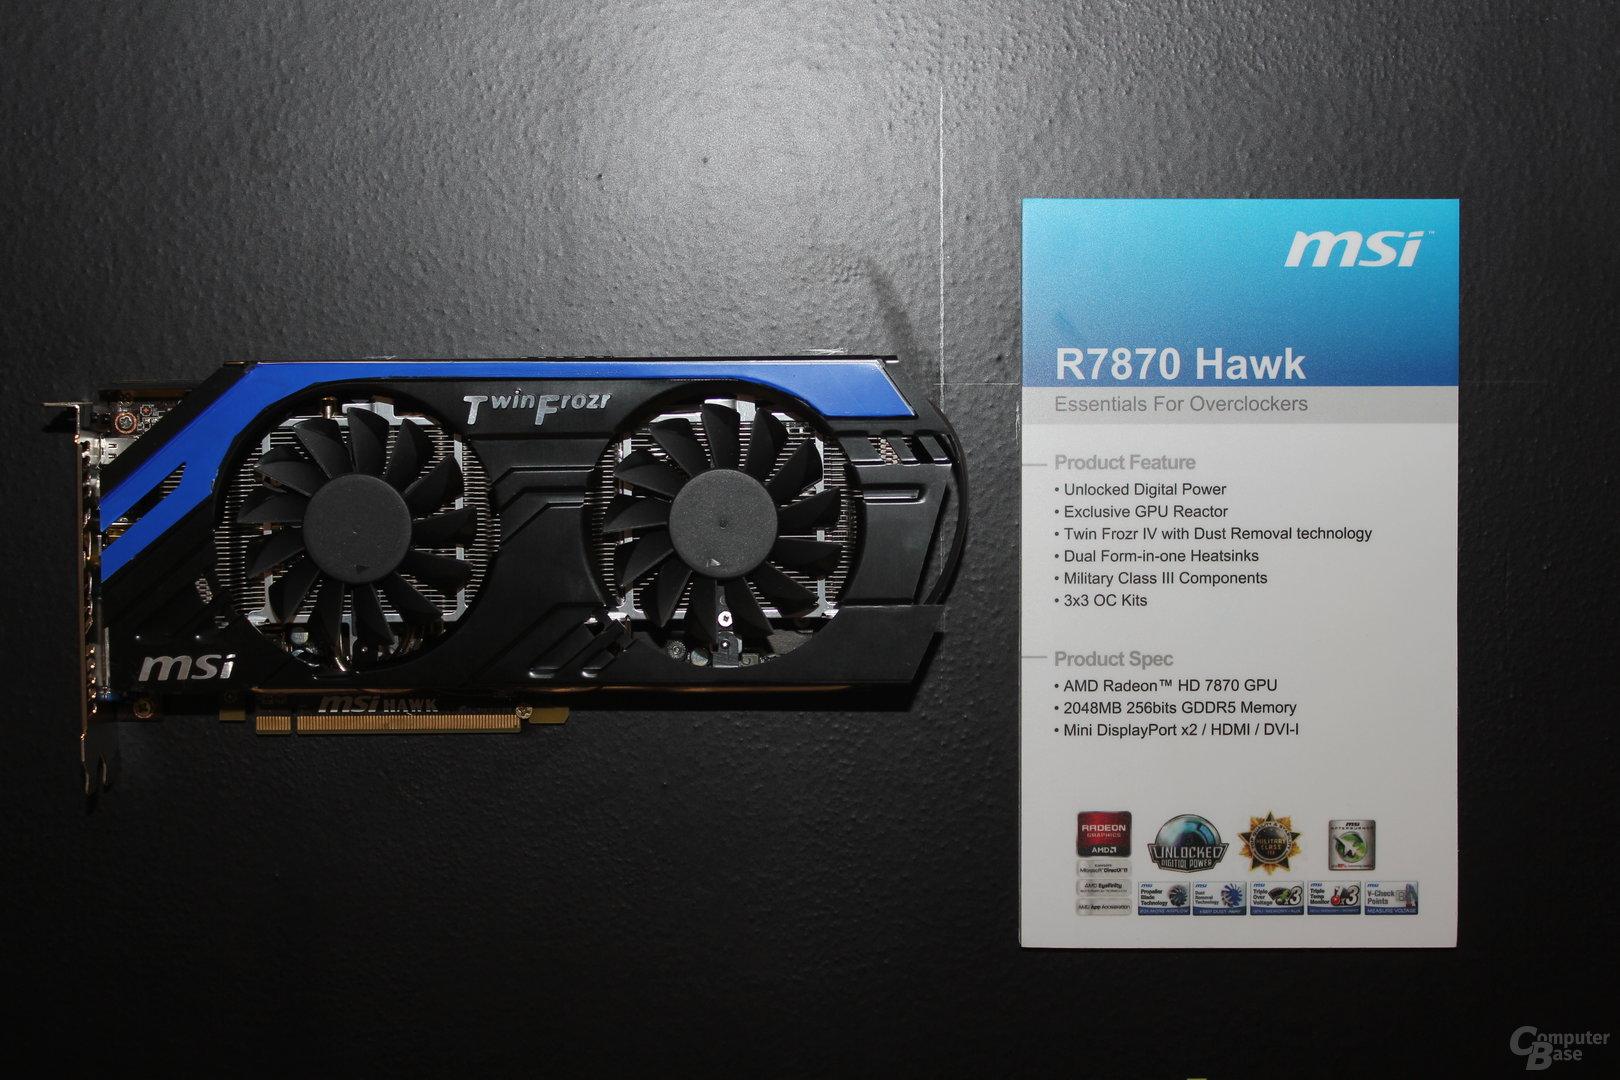 MSI R7870 Hawk